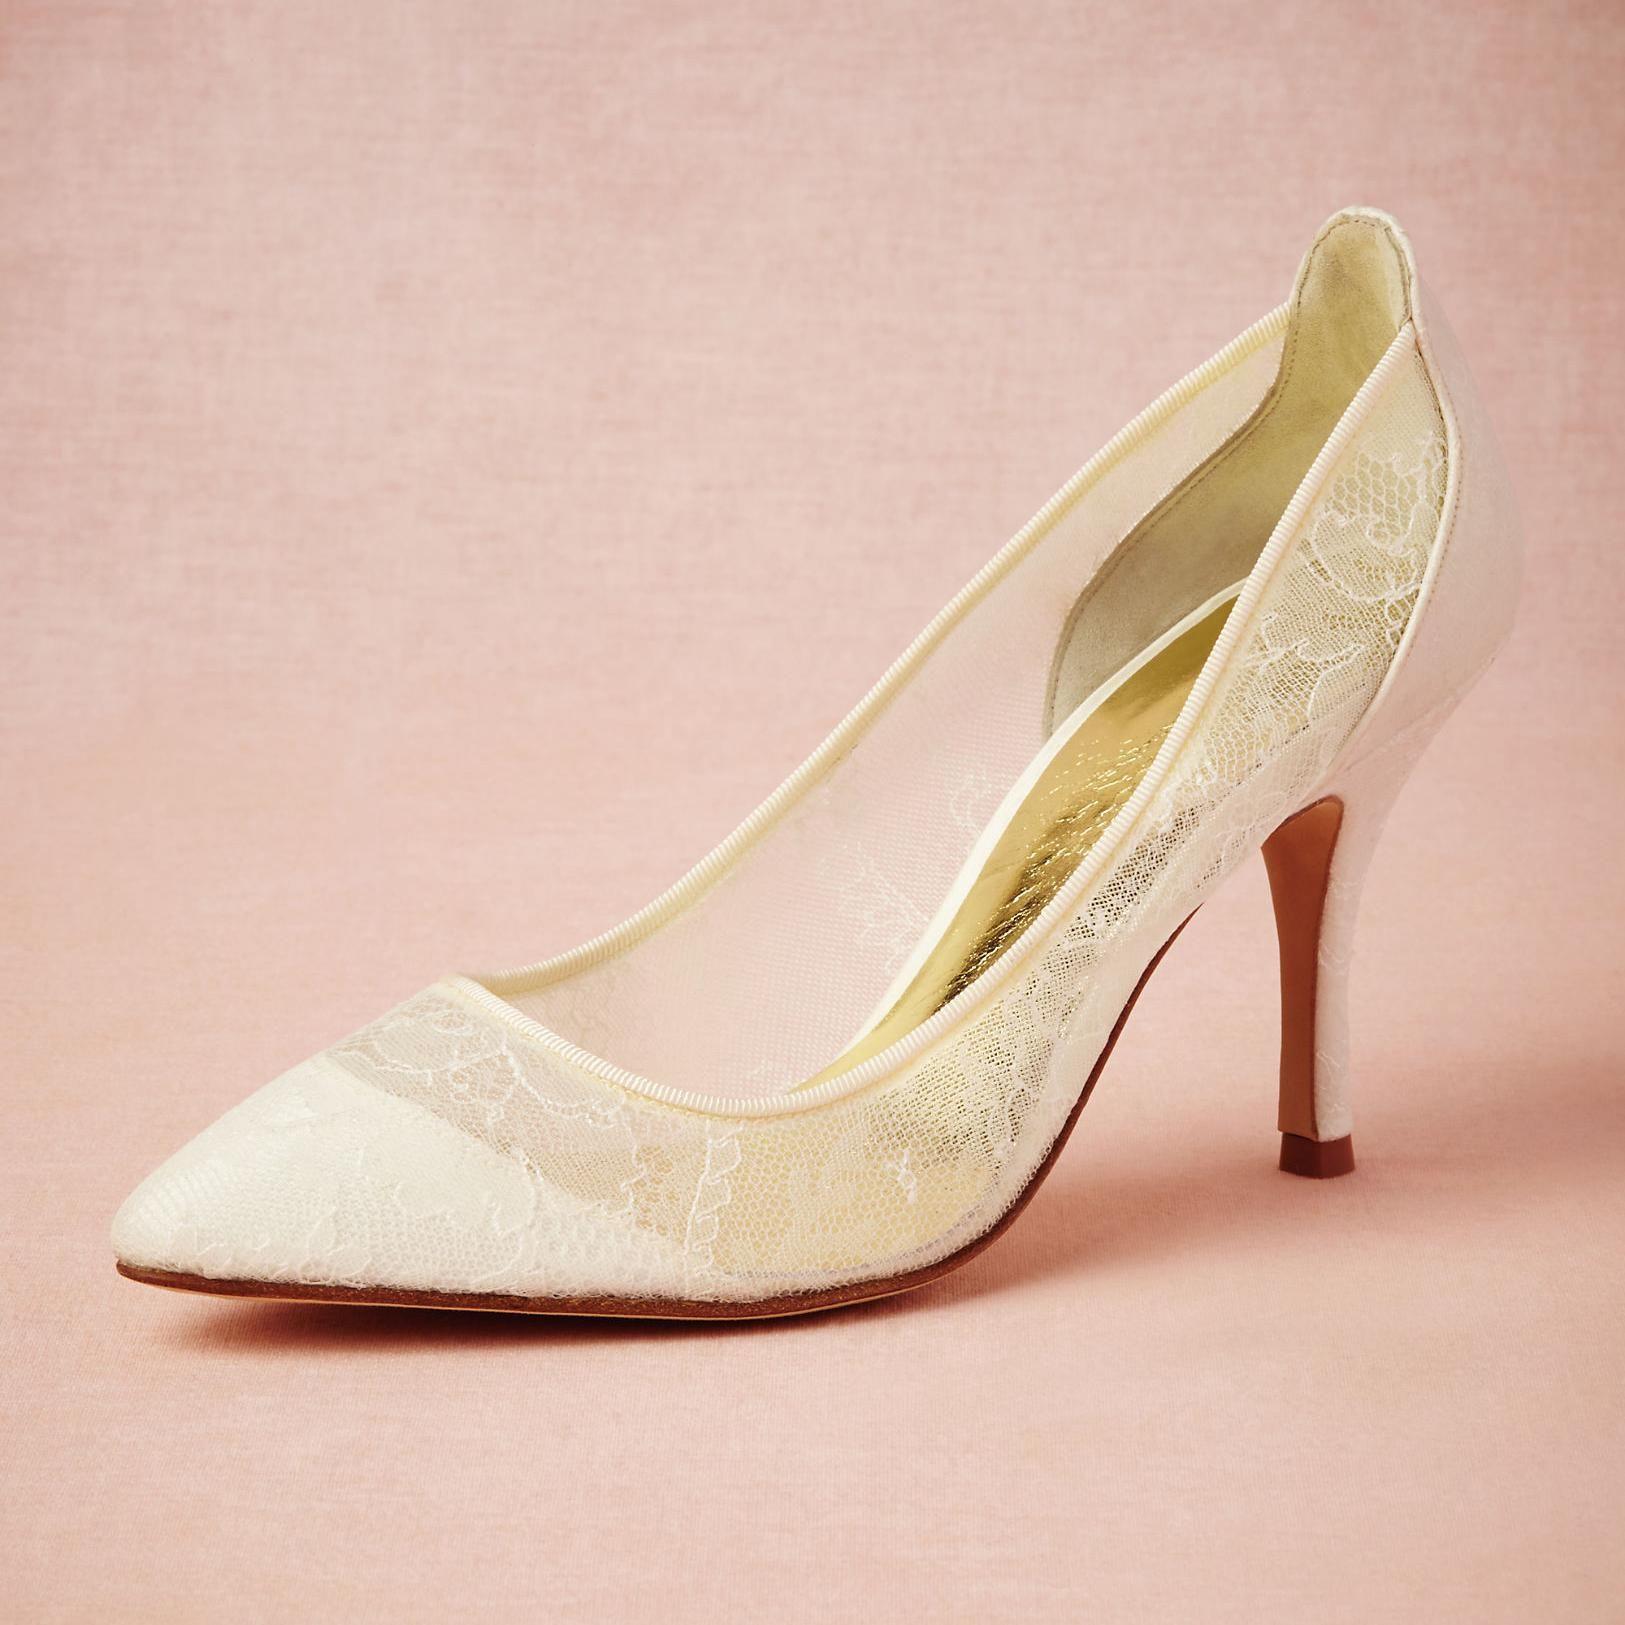 b6c9fa543166 Handmade Lace Wedding Shoes Transparent Pointed Toe Specter Heels Party  Dance Pumps Sandals 3 Kitten Heels Designer Bridal Pump Shoes Bridal Shoes  High ...